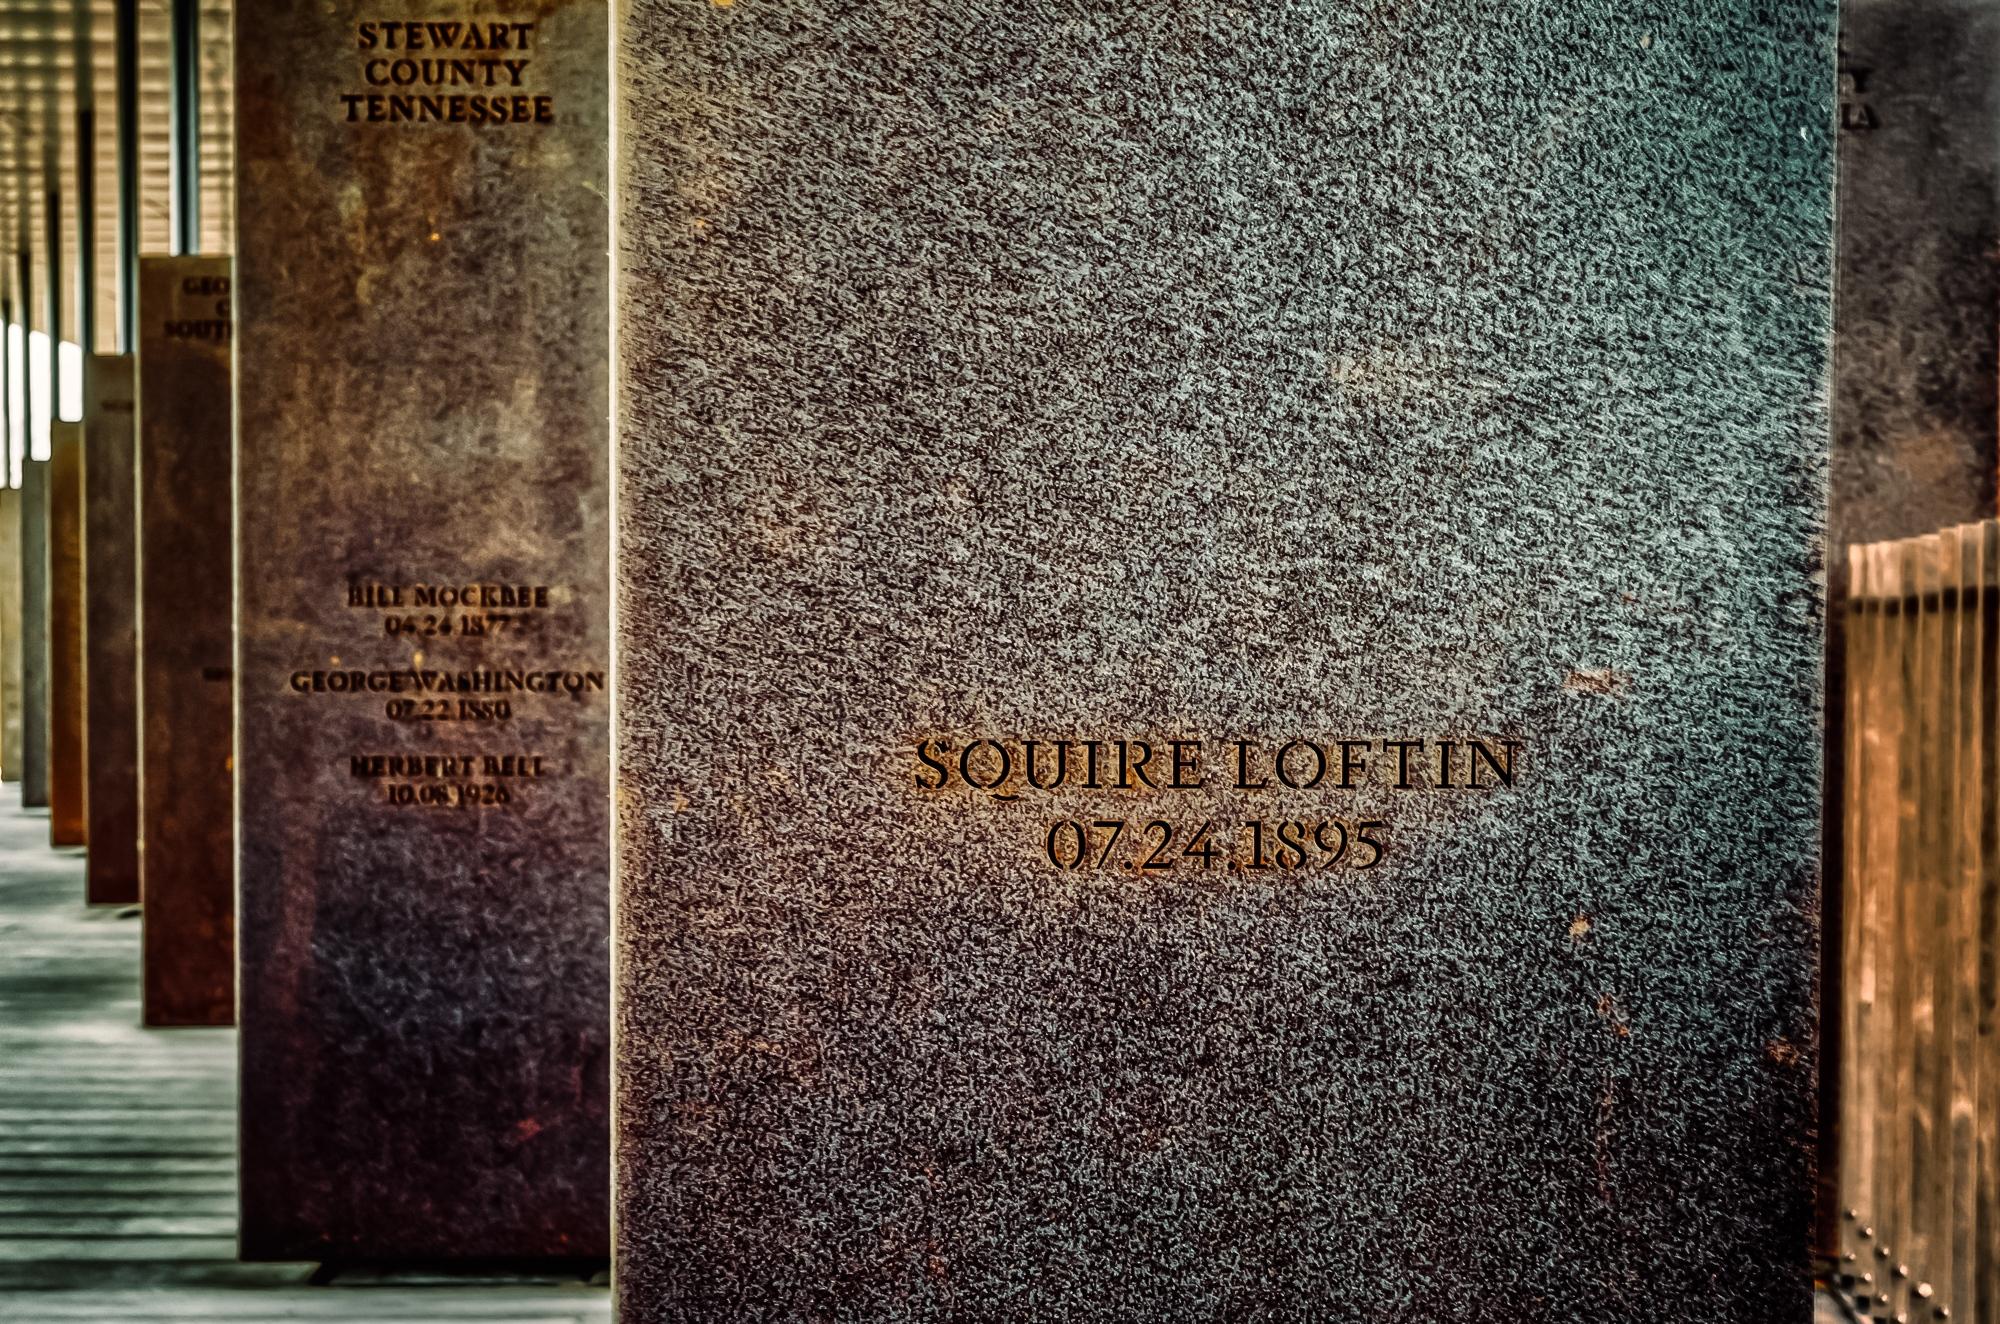 Squire Loftin